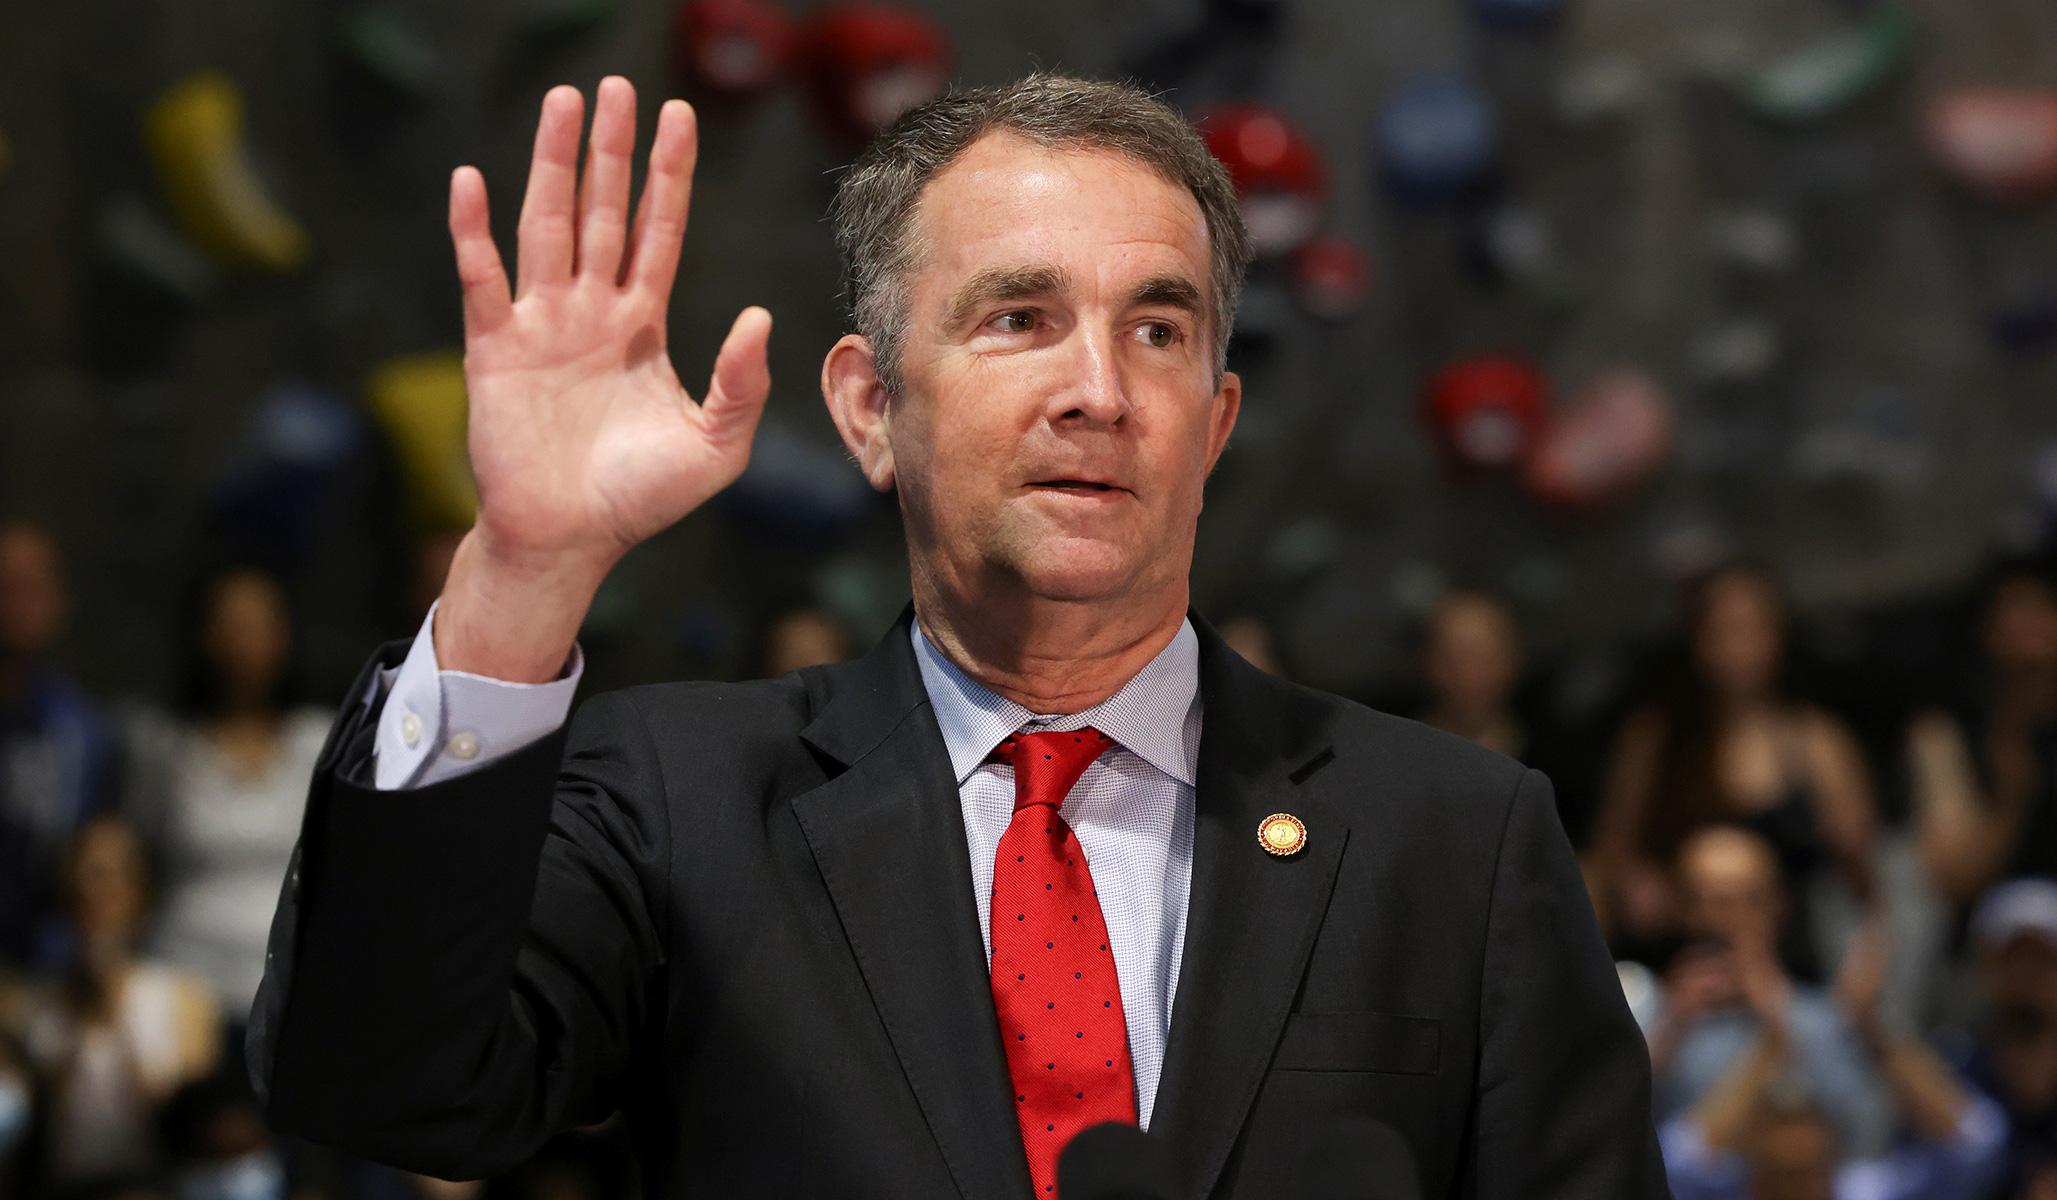 Demokrat Virginia Memilih untuk Mengizinkan Sekolah Menahan Diri dari Melaporkan Baterai Seksual pada tahun 2020